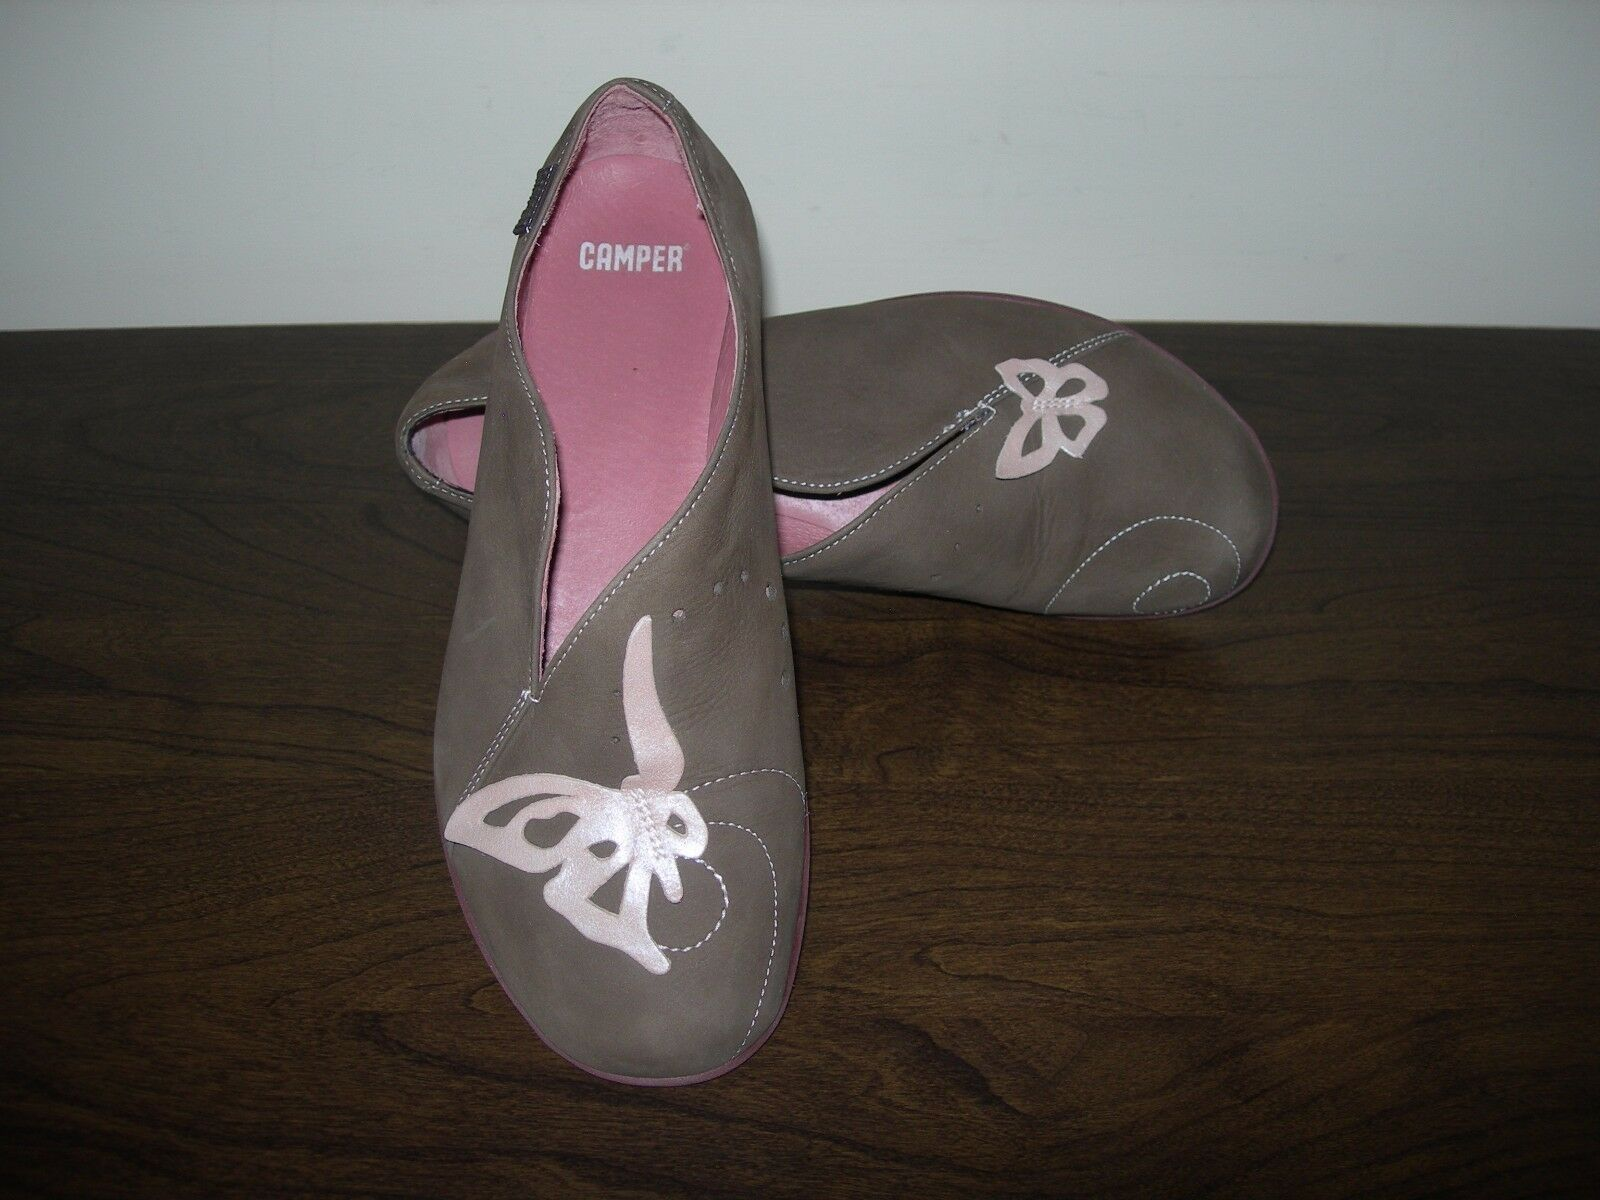 CAMPER WOMEN'S Schuhe SLIP ON PUMPS OLIVE GREEN LEATHER BUTTERFLIES EU 37 / UK 4